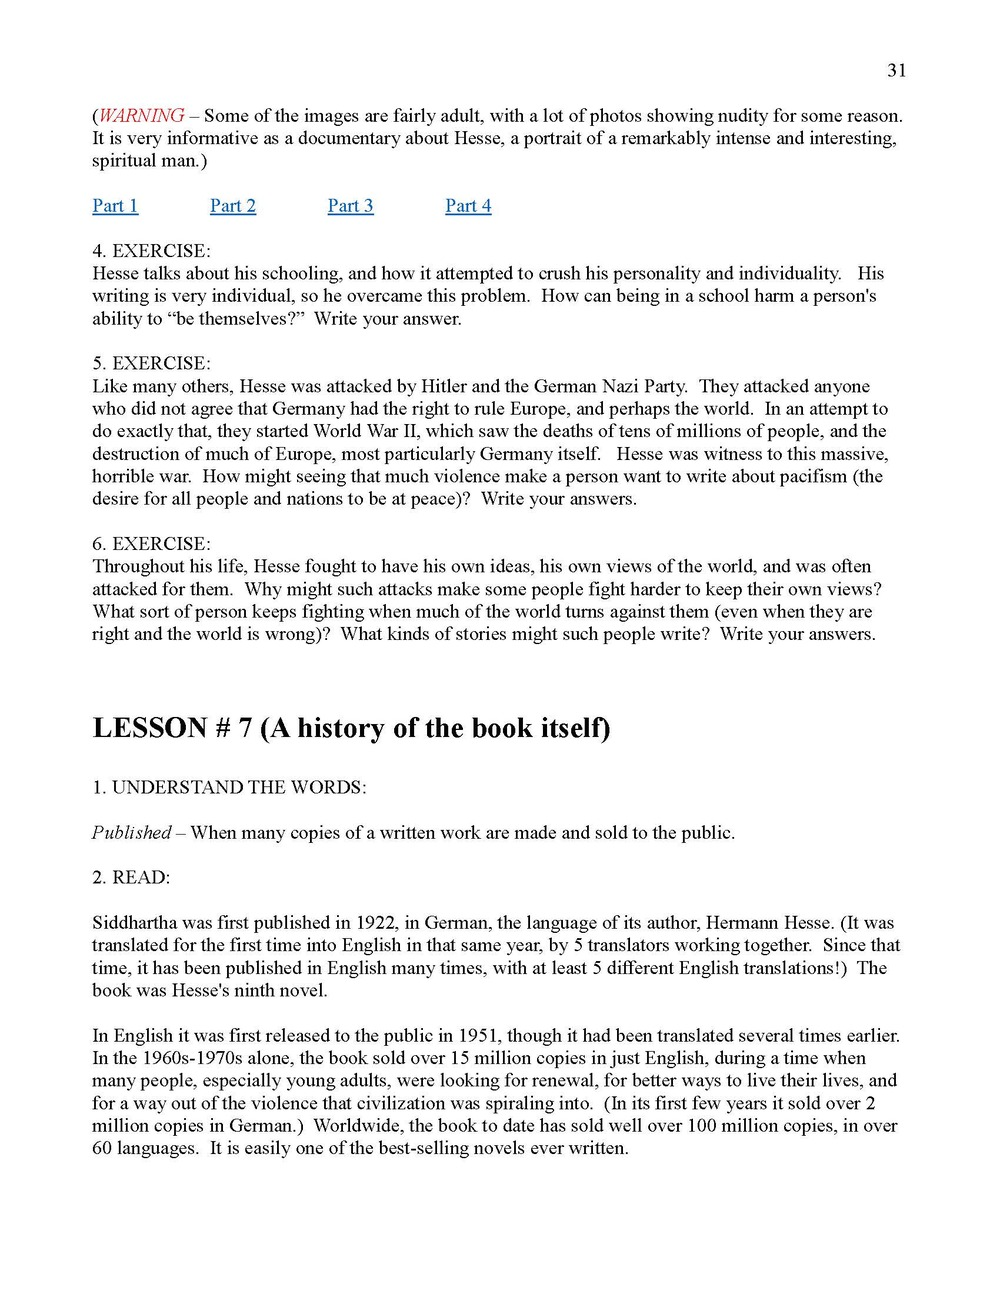 Step 4 Literature Guide - Siddhartha_Page_032.jpg